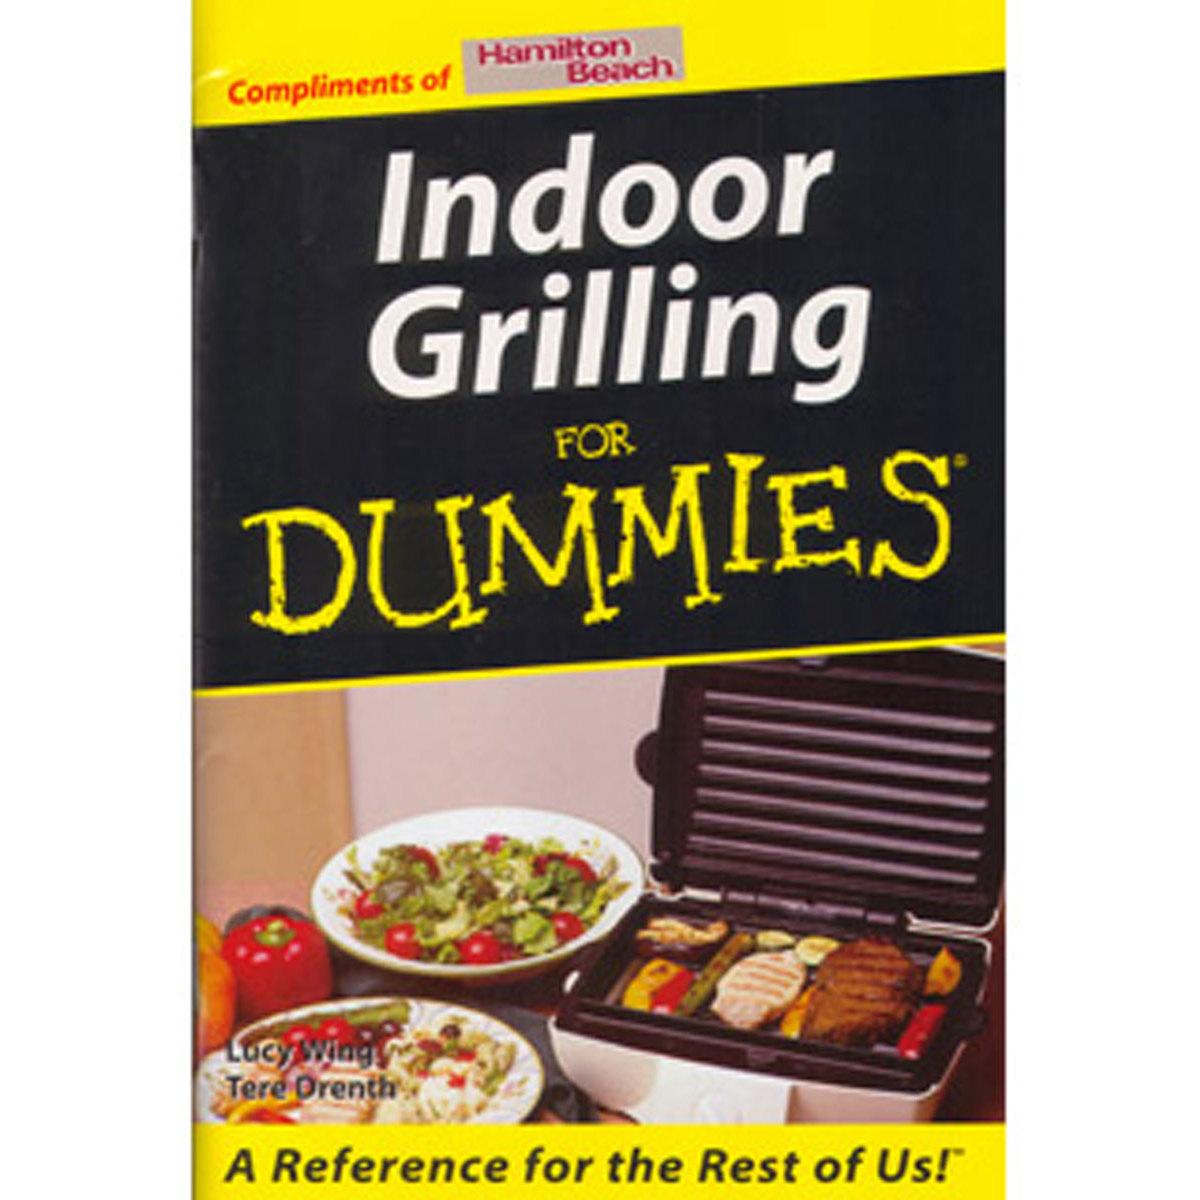 Indoor Grilling for Dummies Book (D426)